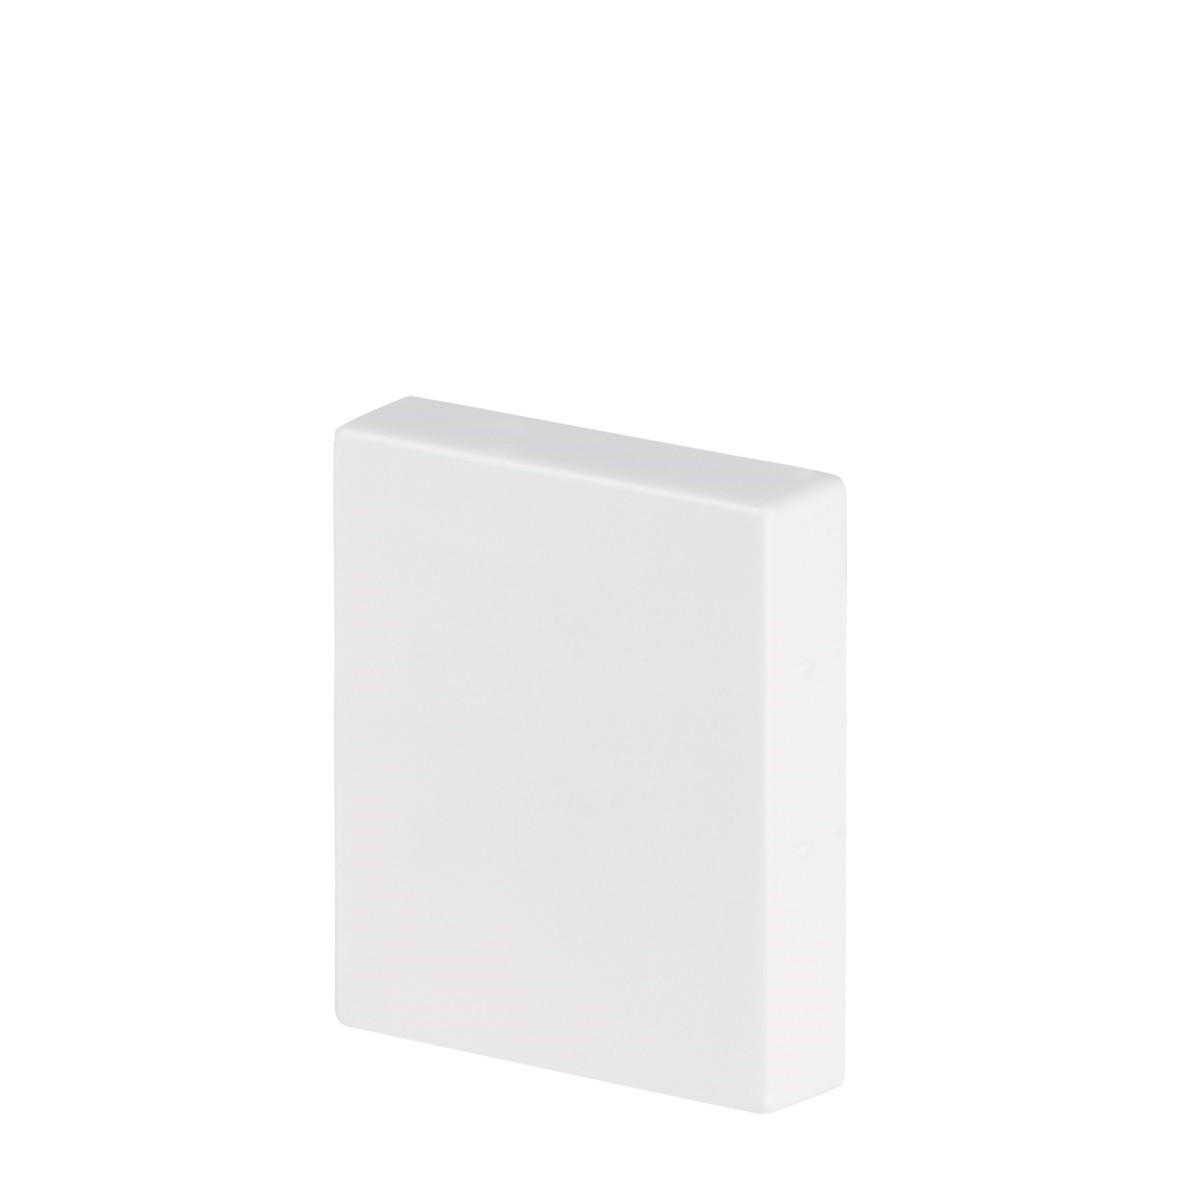 Rodape Socalo 12 x 1700 cm Poliestireno Branco - Arquitech